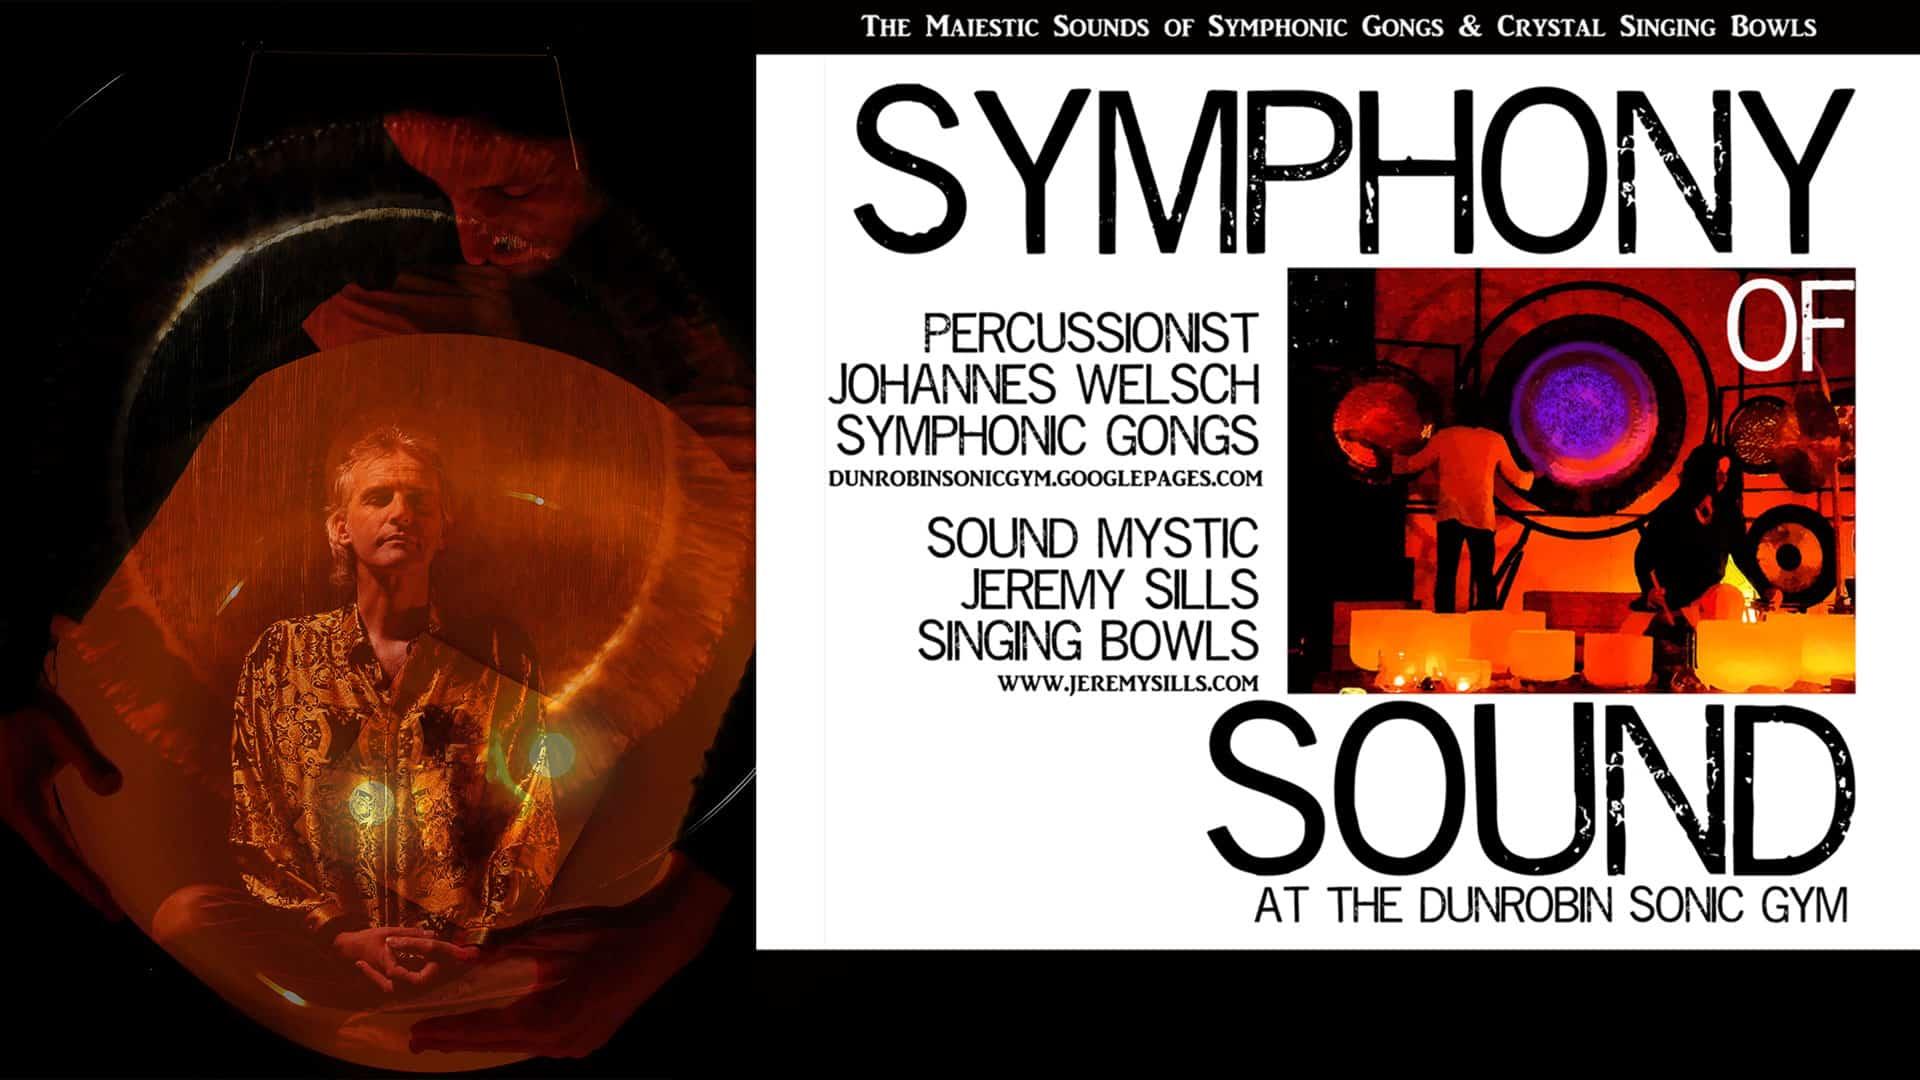 SOS-symphony-of-sound-sills-welsch